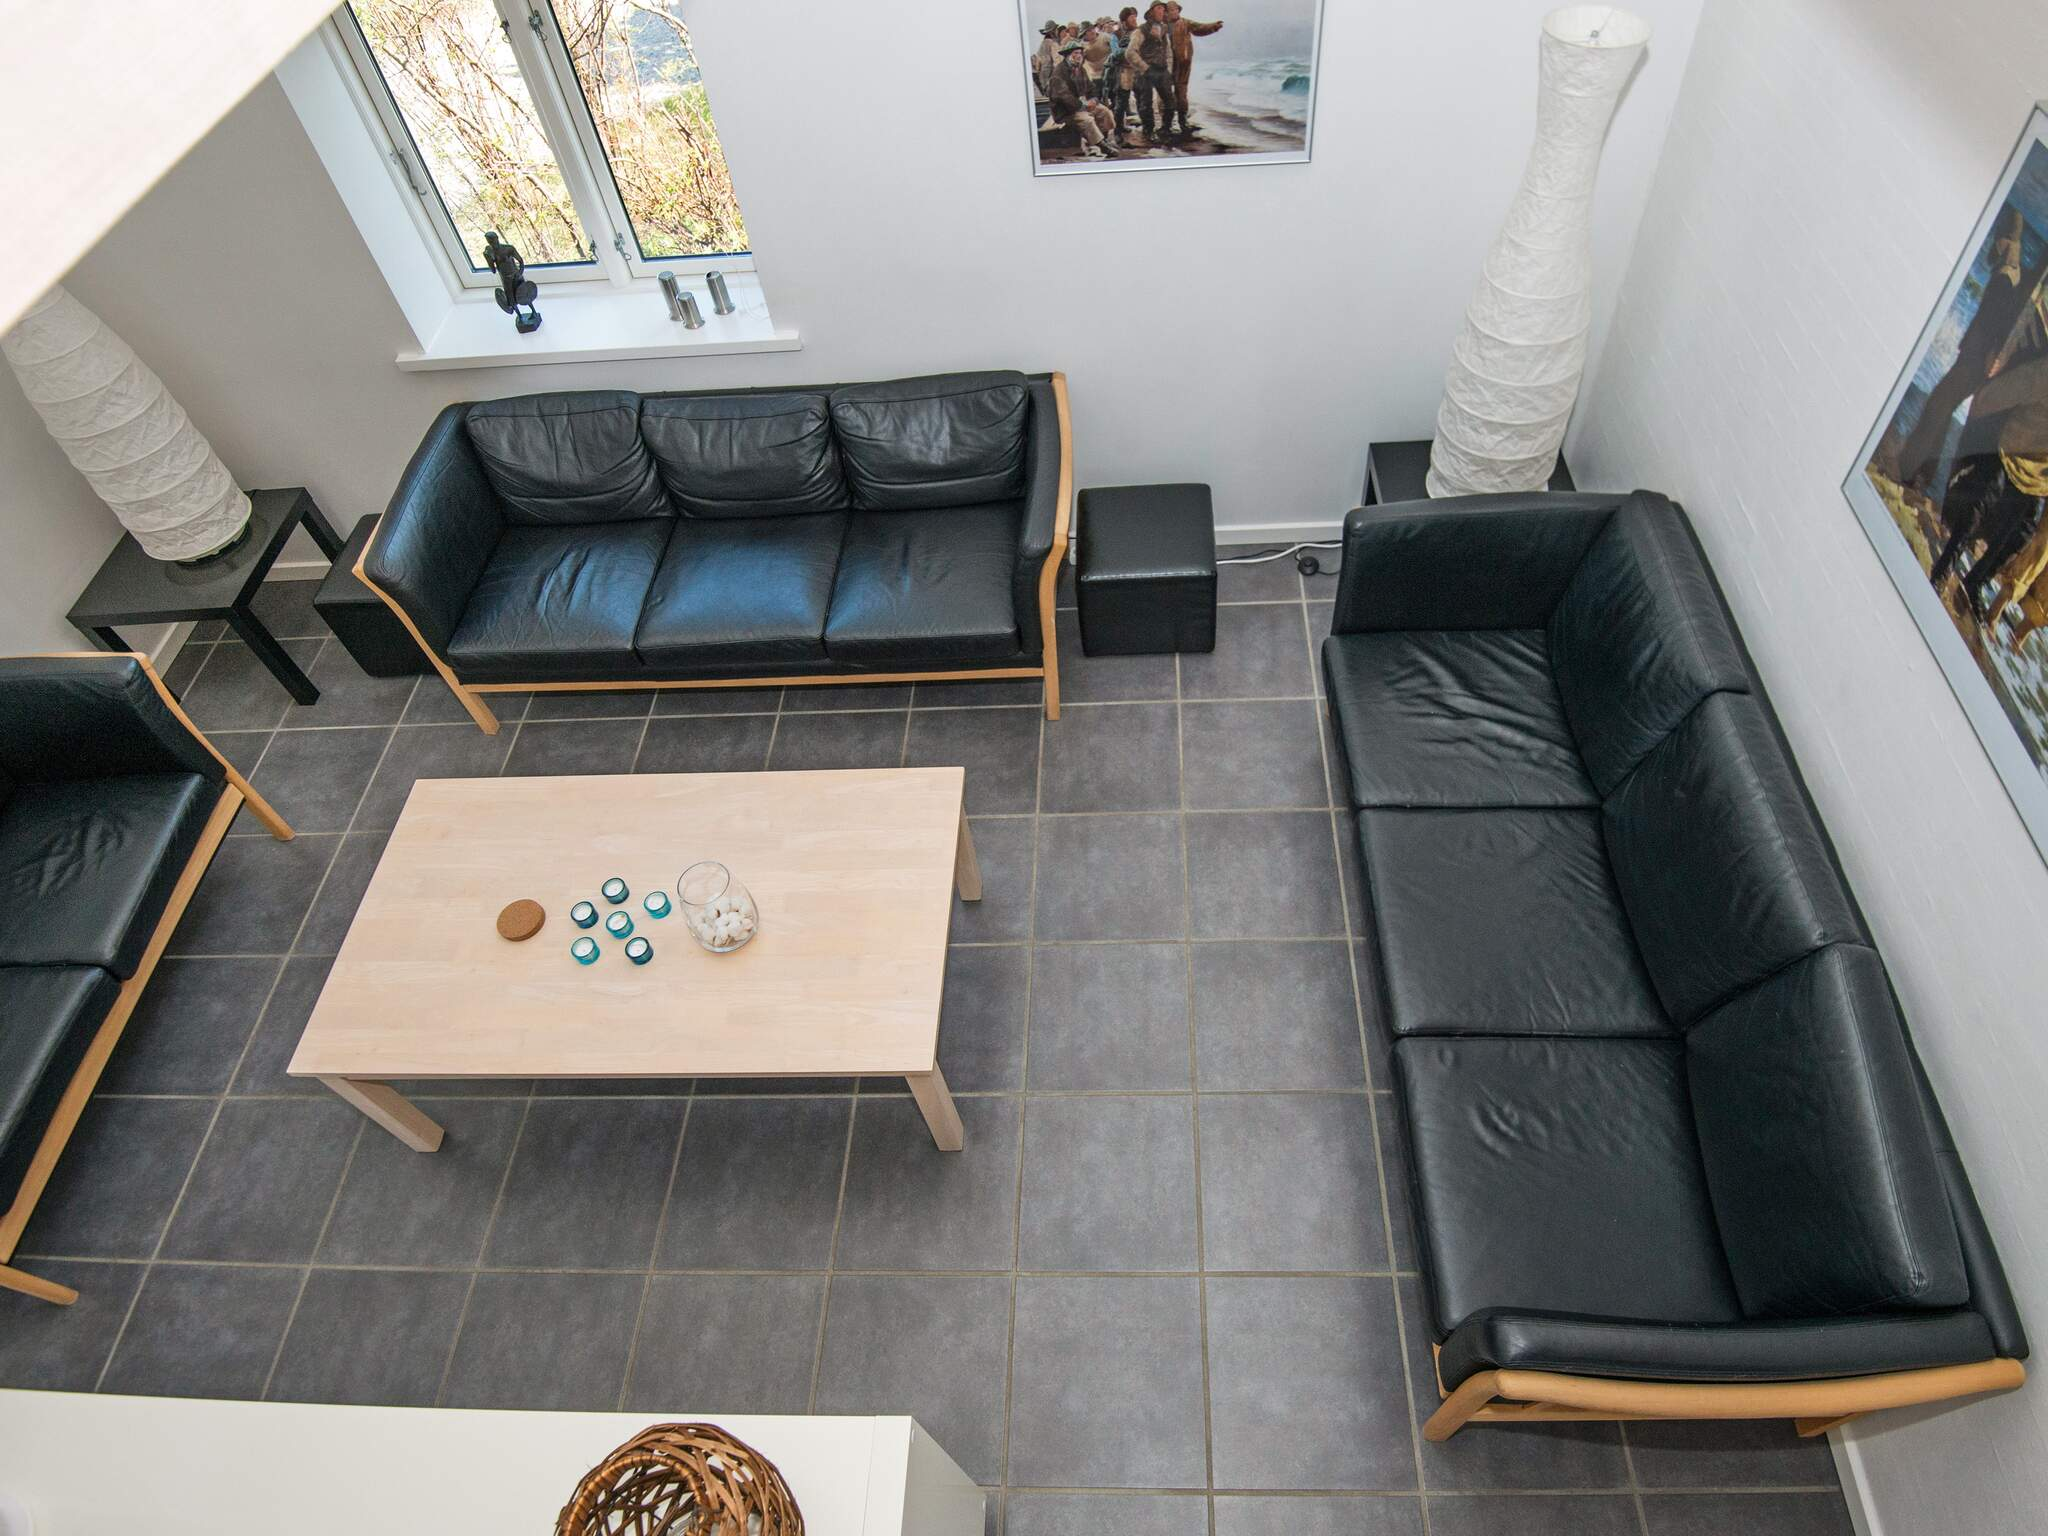 Maison de vacances Helgenæs (590964), Knebel, , Mer Baltique danoise, Danemark, image 5